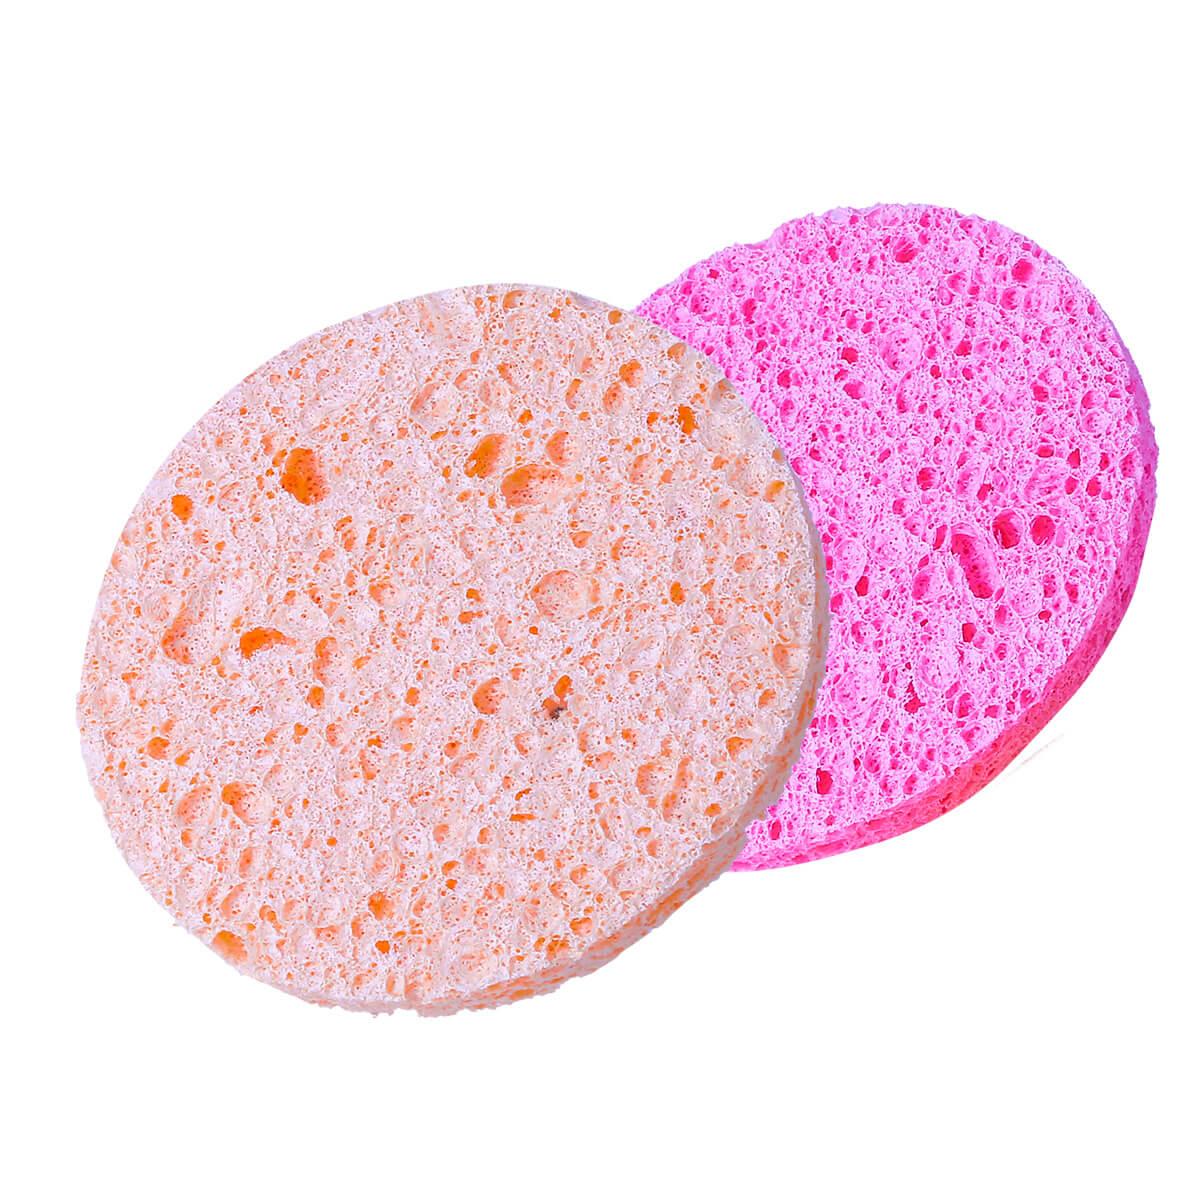 Esponja Esfoliante Redonda Para Limpeza Facial R813 Sffumato Beauty